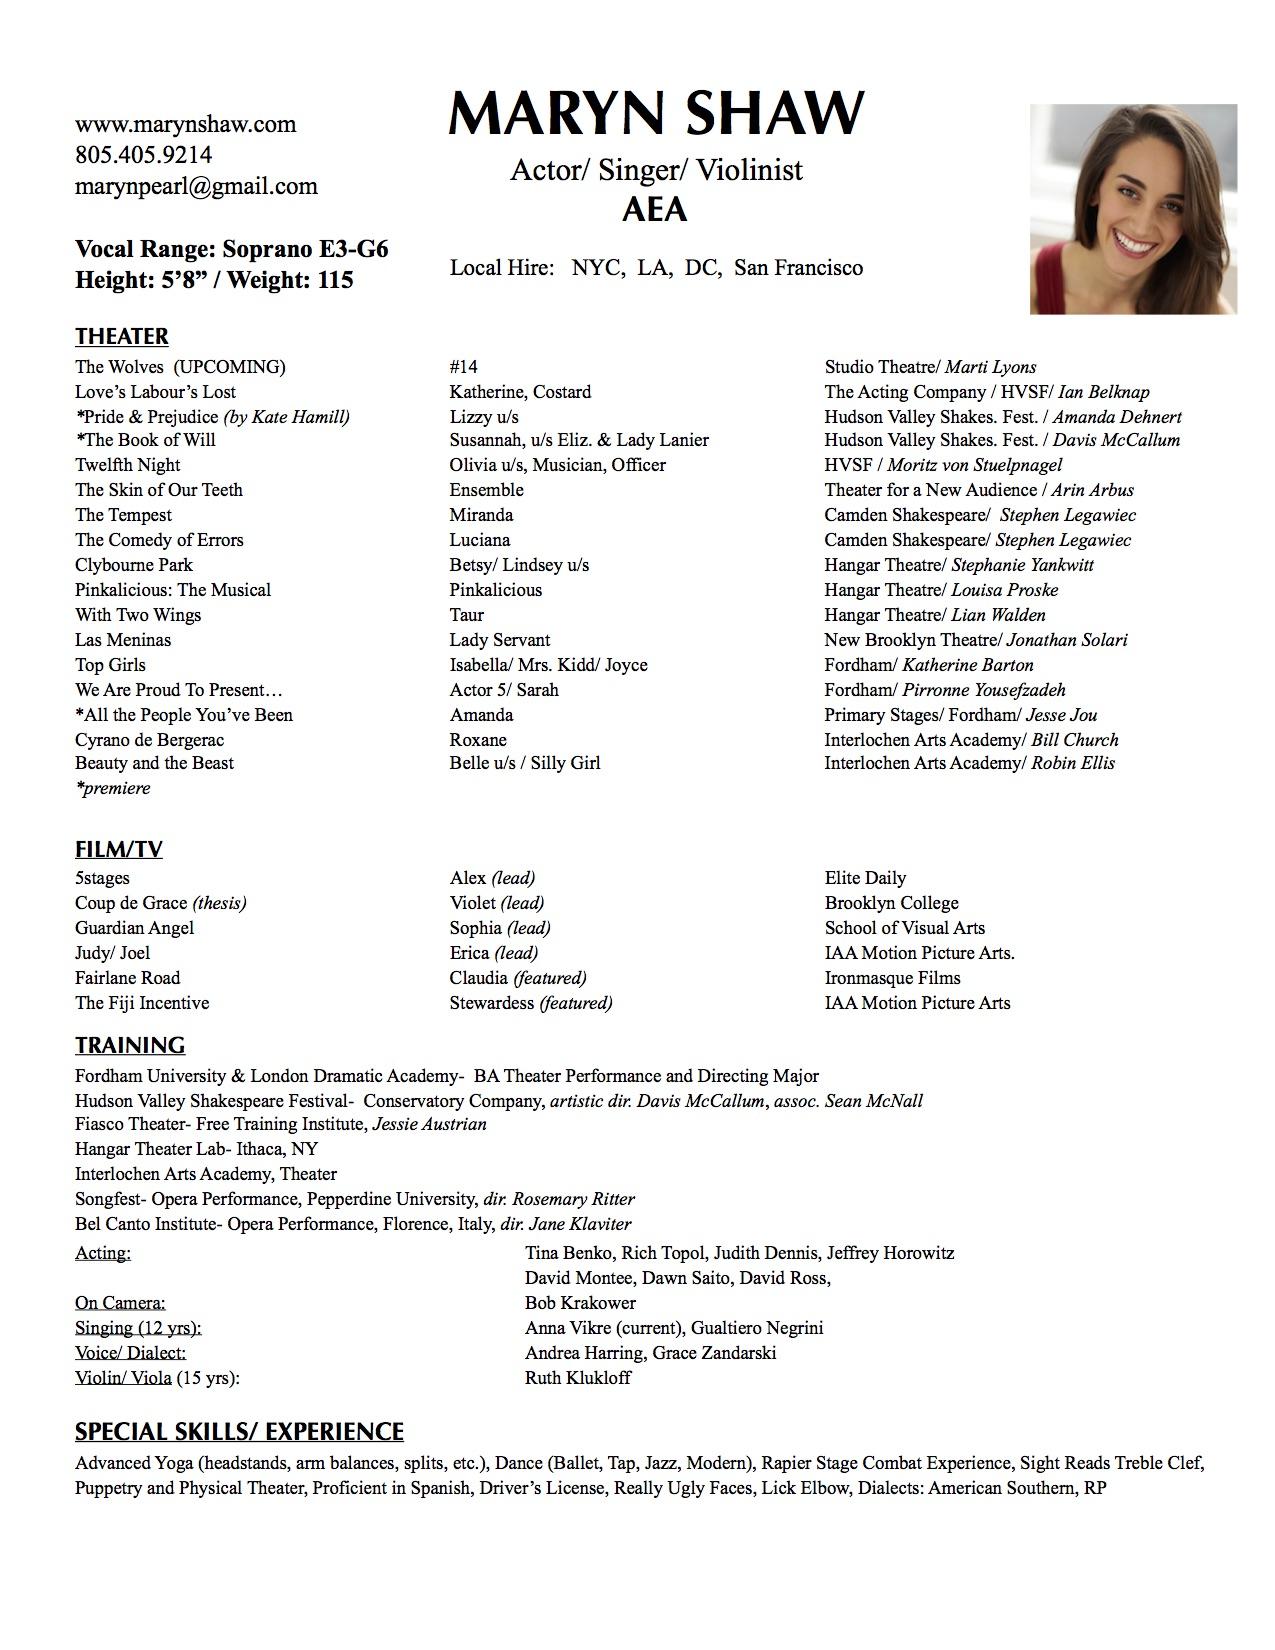 resume Violinist Resume resume maryn shaw